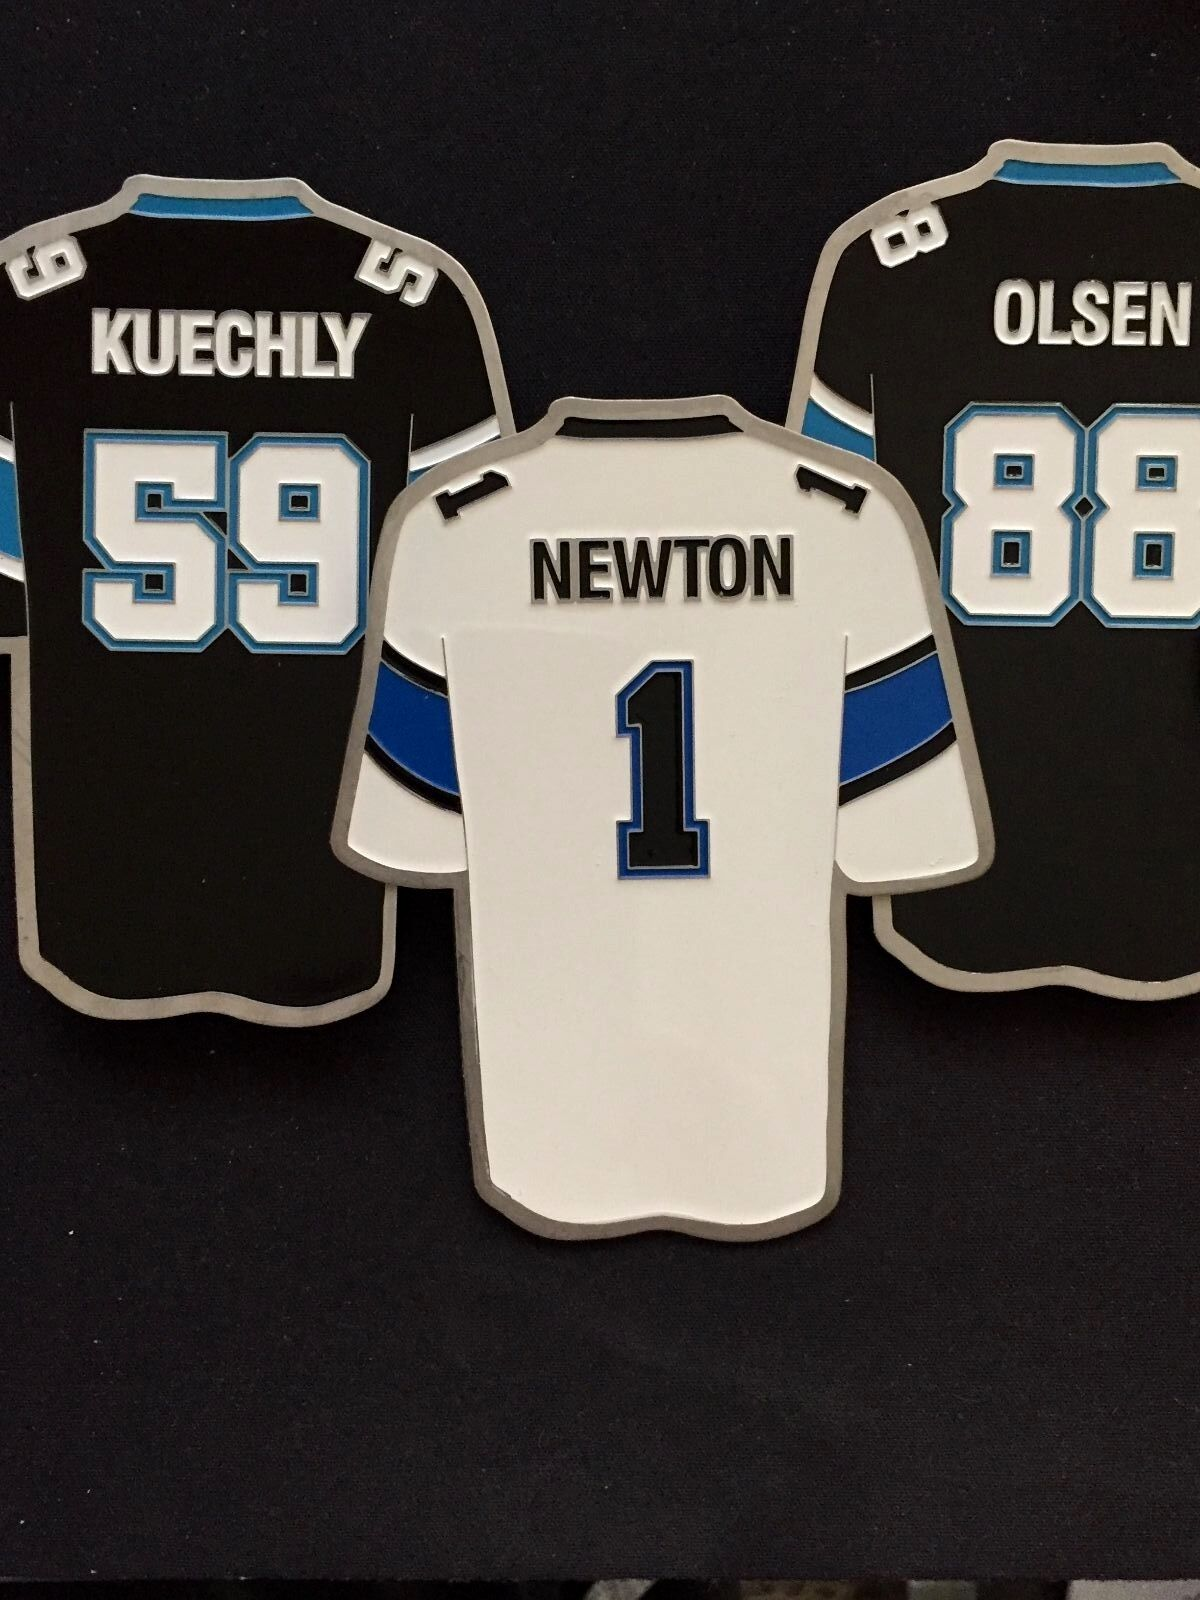 Carolina Panthers Reversnadel Reversnadel Reversnadel Set (3) - Jumbo Größe Klassisch Sammelobjekt    Produktqualität  7301e7